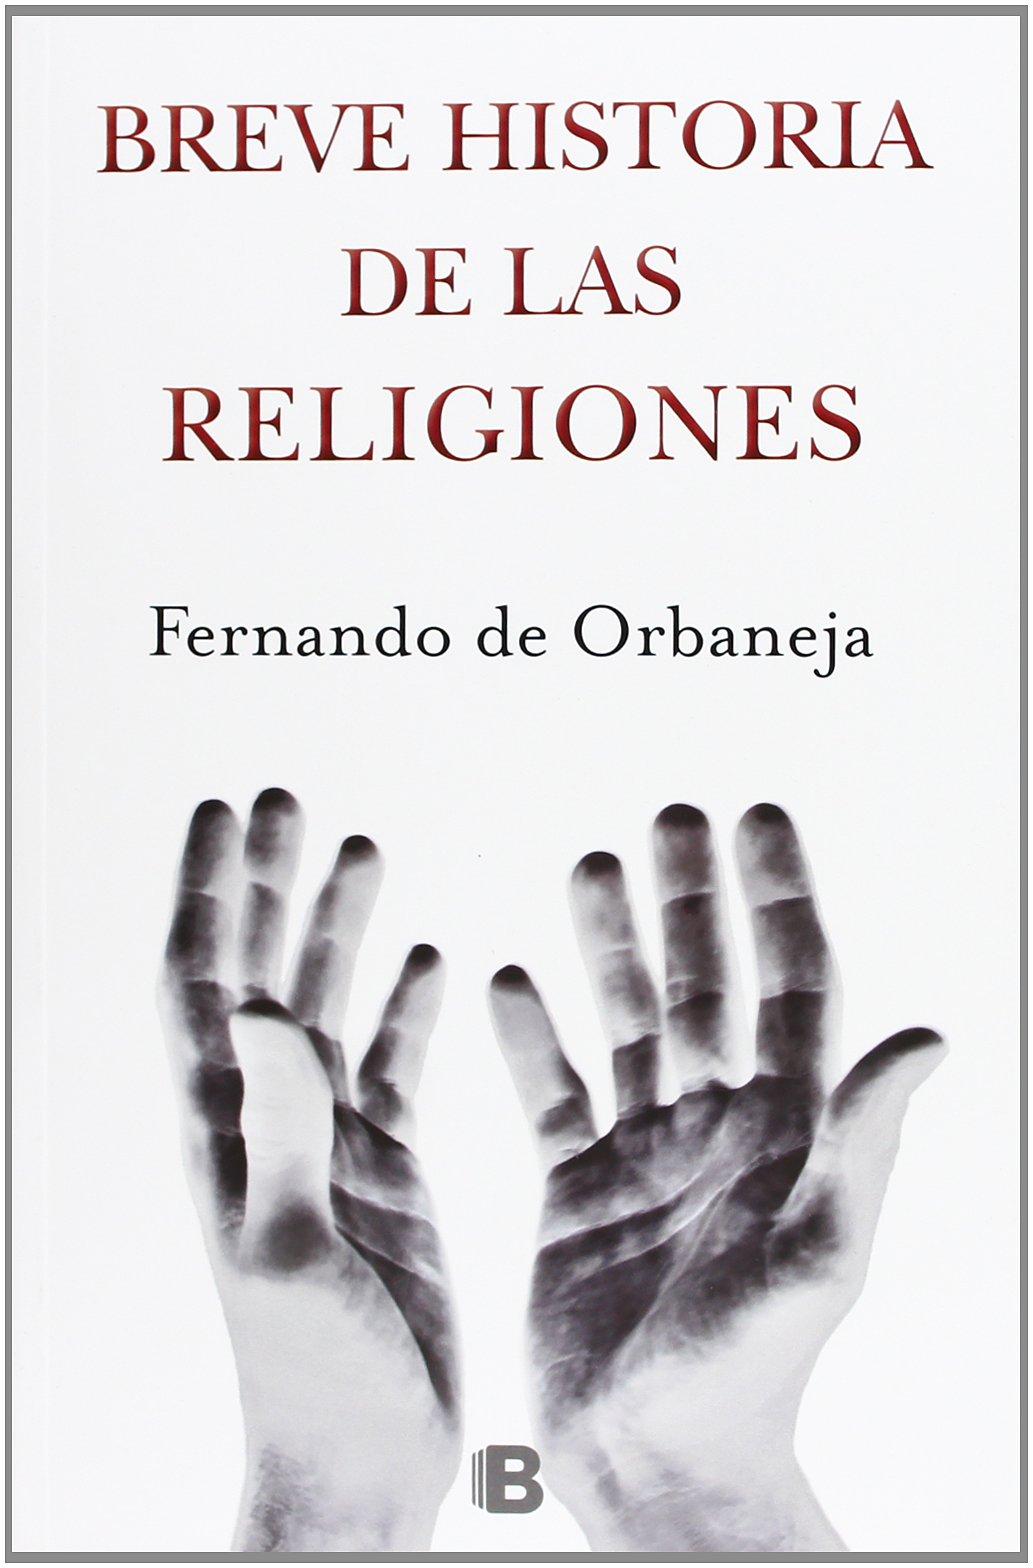 Breve Historia De Las Religiones  B DE BOLSILLO